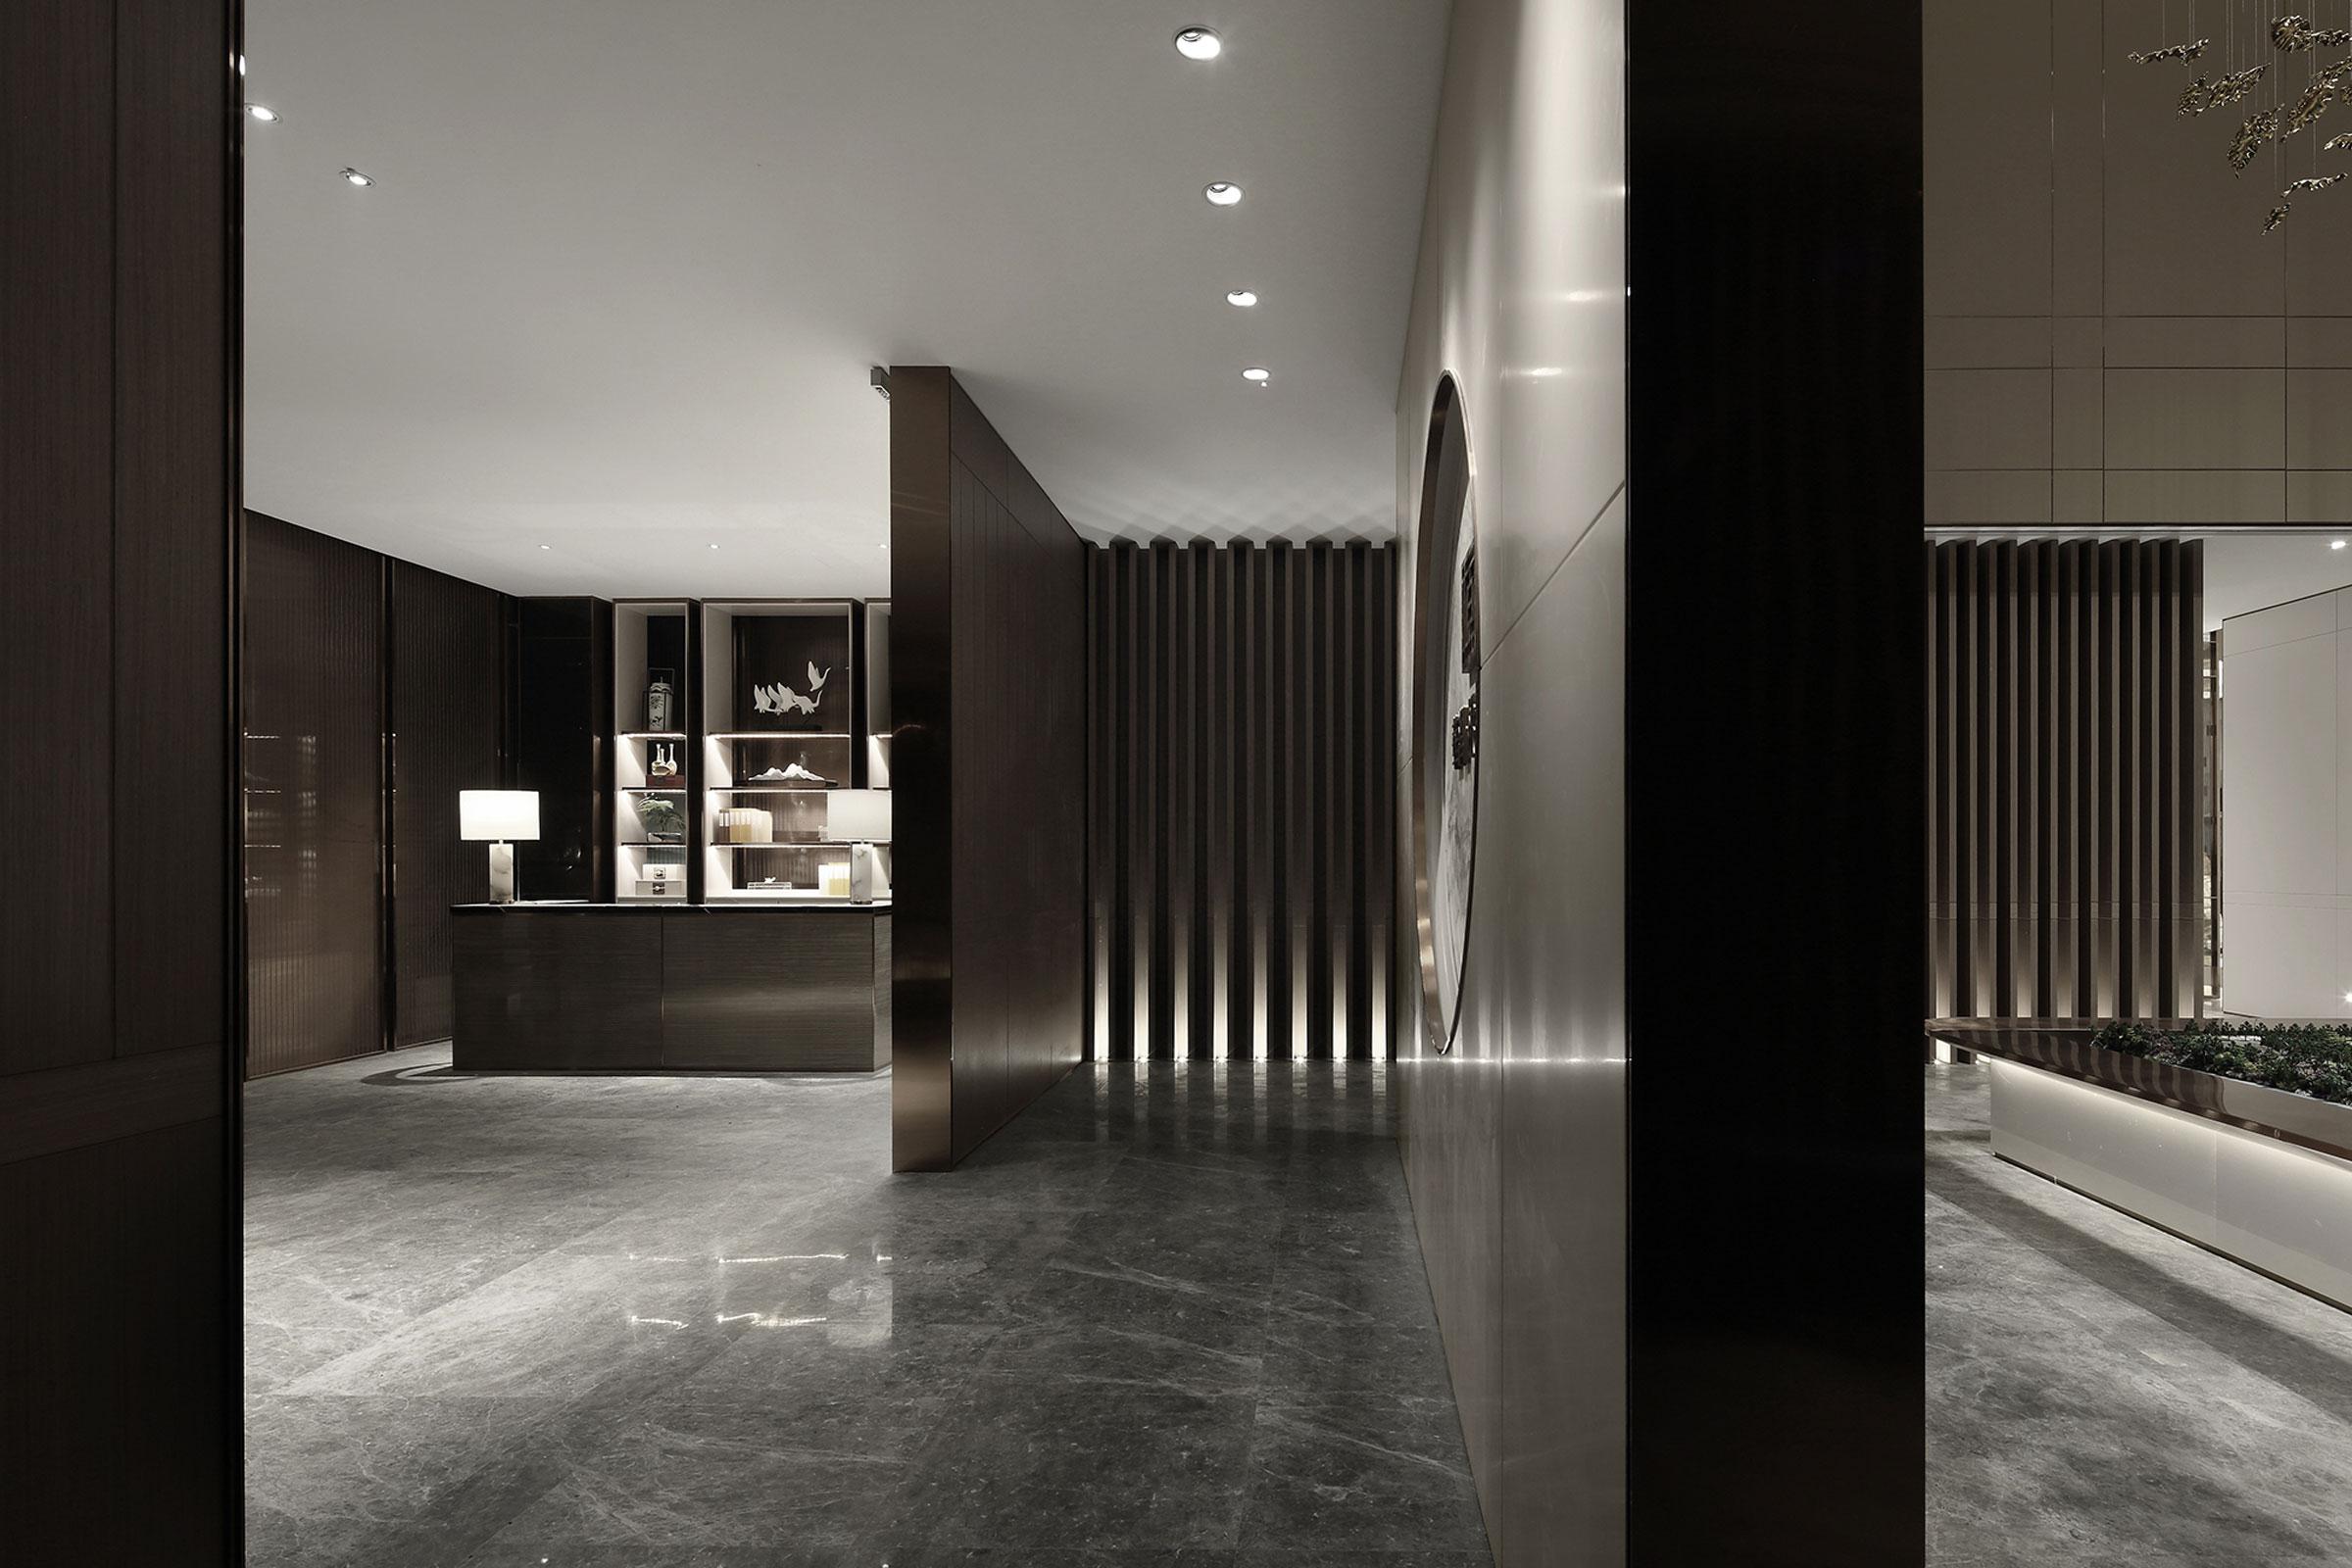 01-front-hall(reception-area).jpg